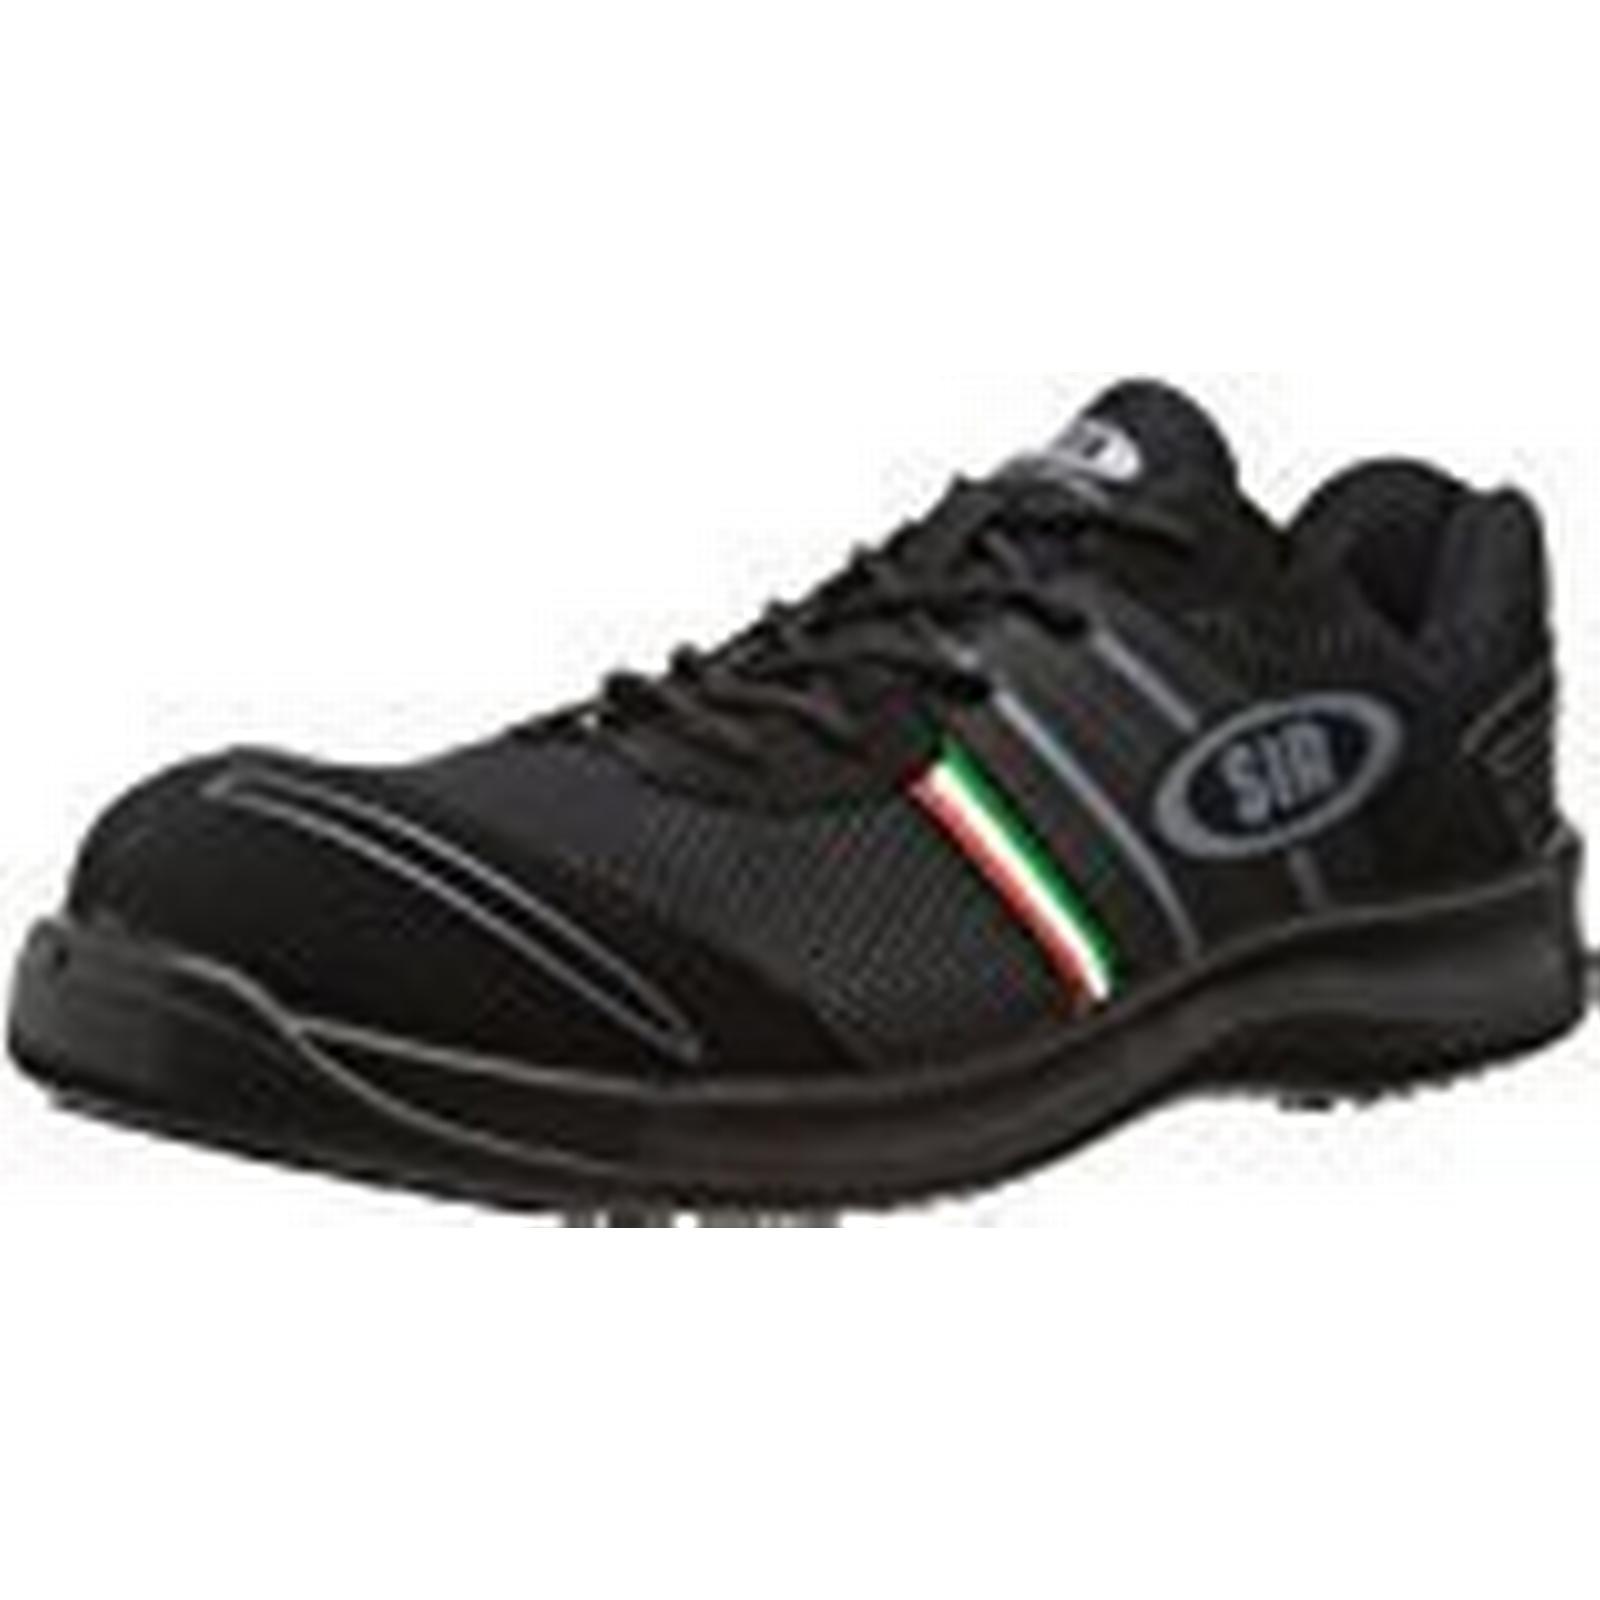 SIR Safety Unisex-Adult Fobia Mesh Safety UK, Shoes 26077 Black 9 UK, Safety 43 EU - EN safety certified cc4d20